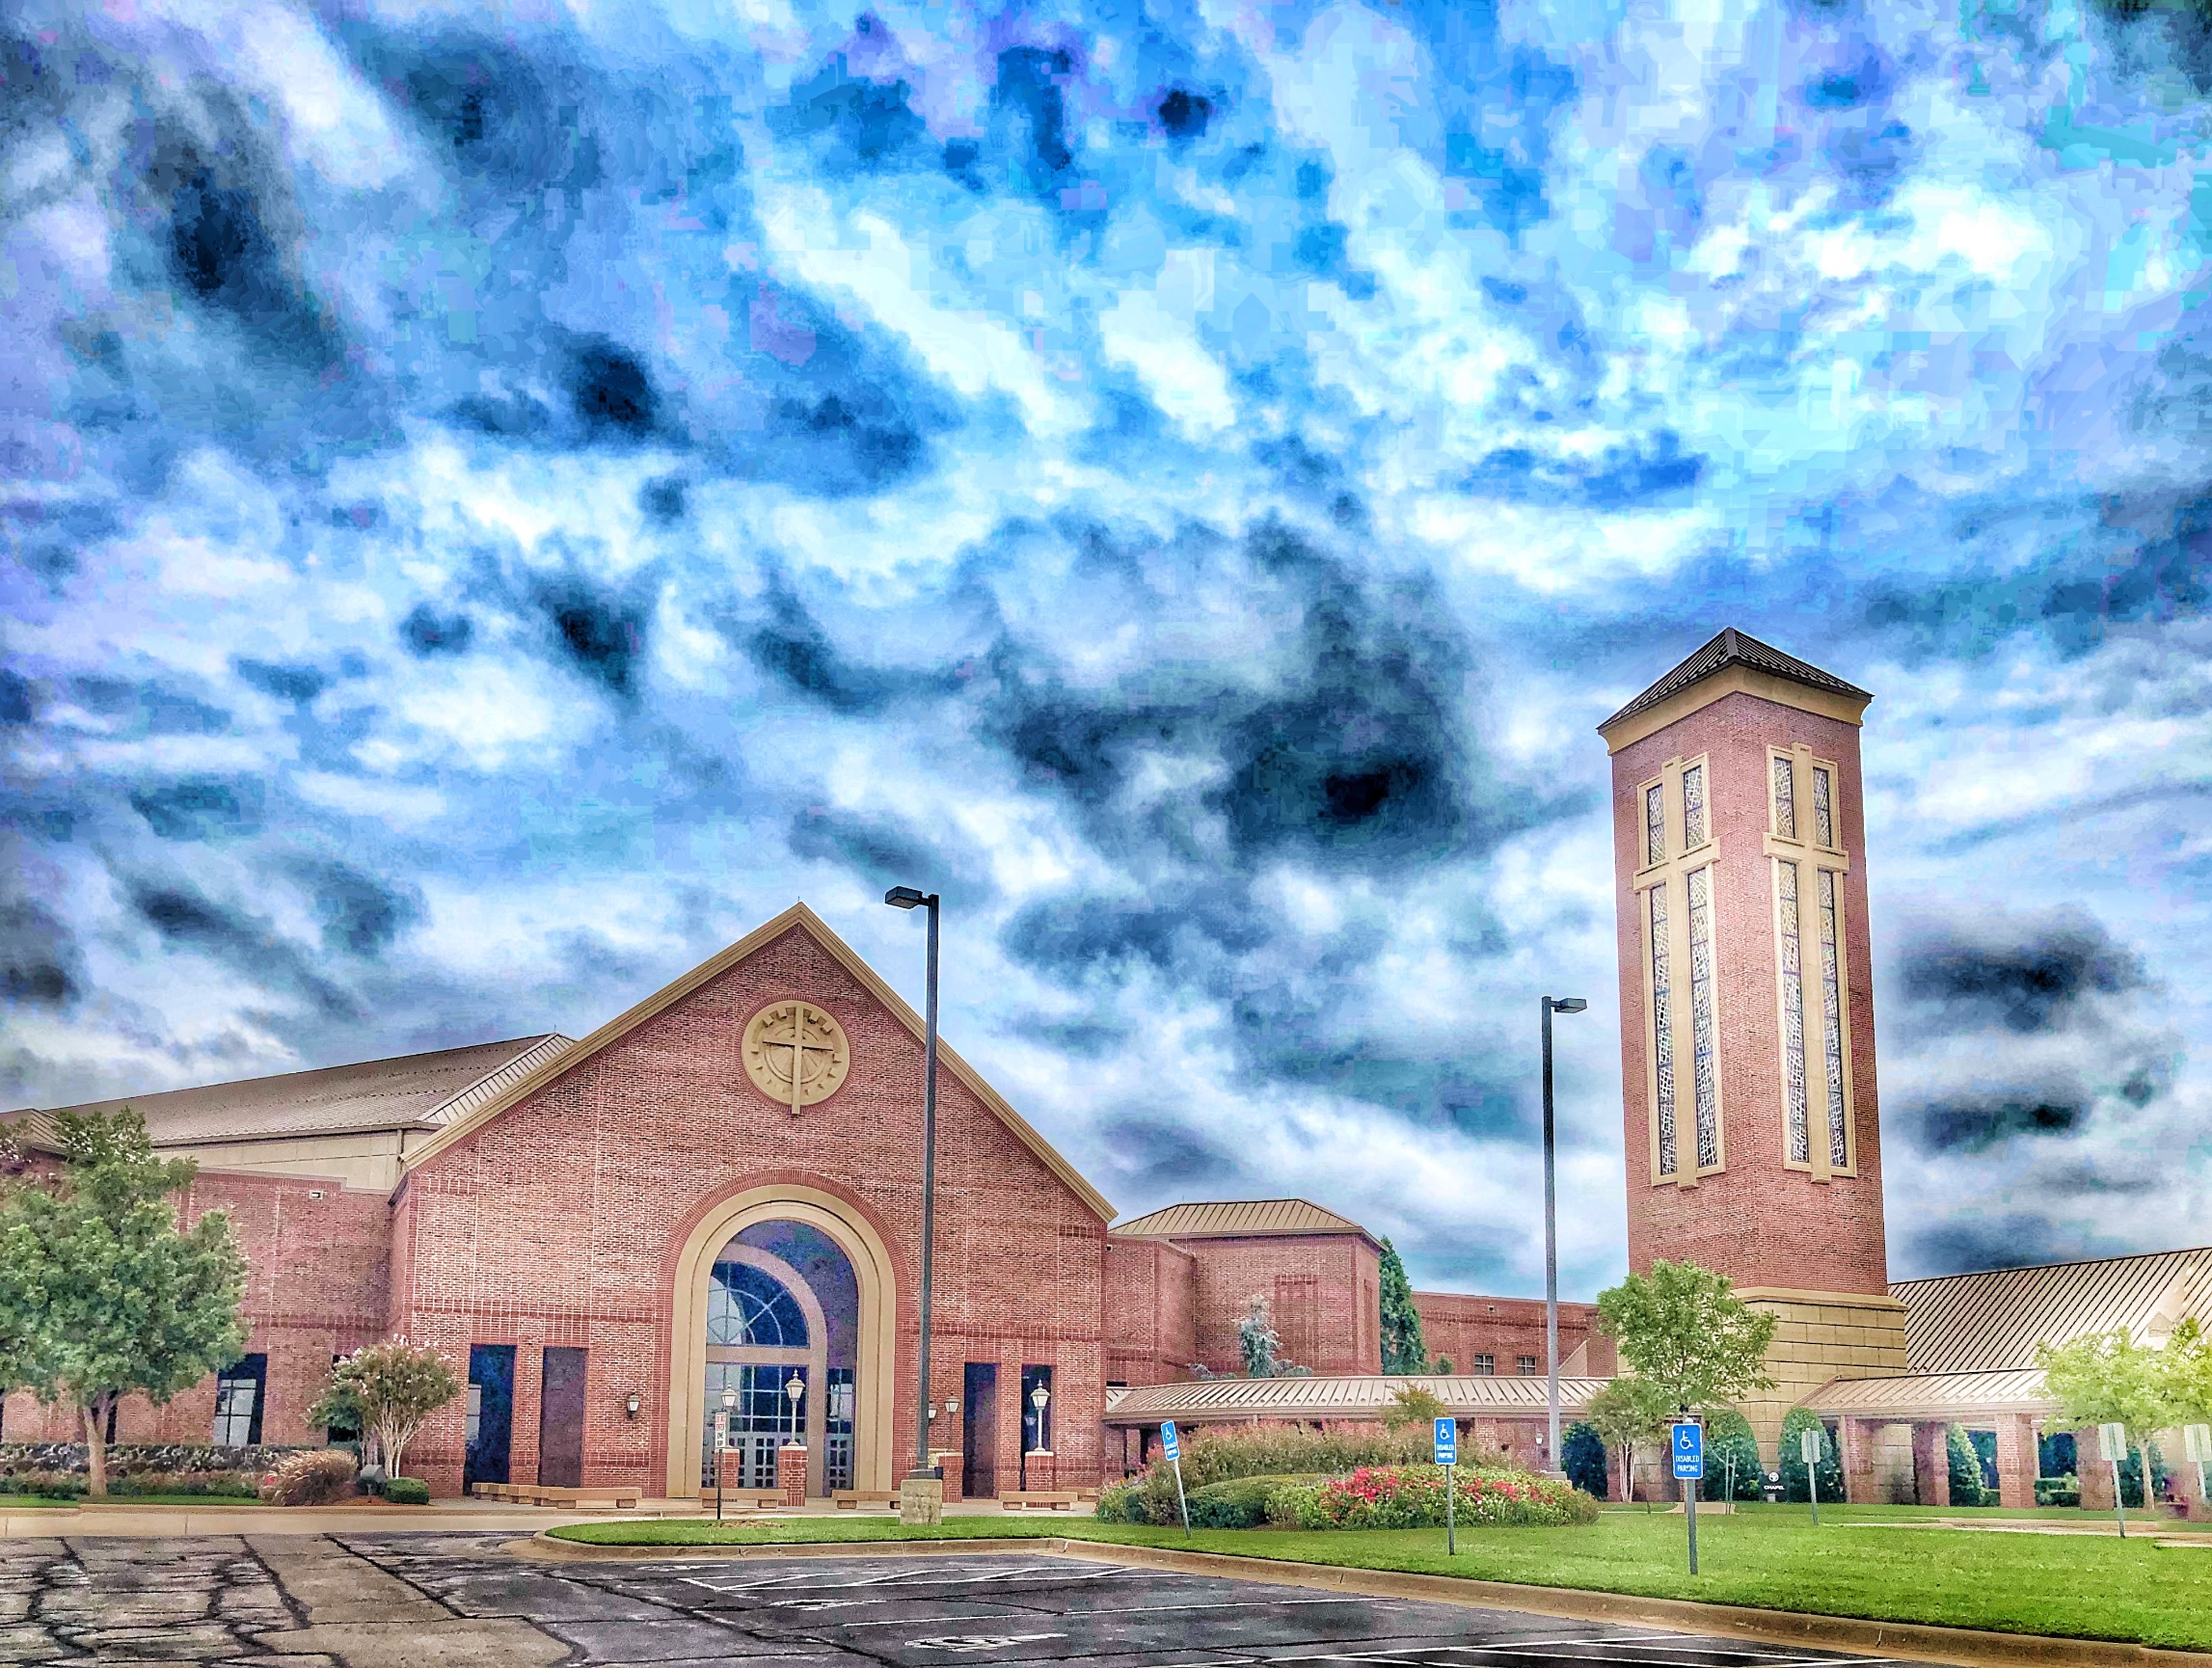 Crossings Community Church OKC - FridayNightArt com